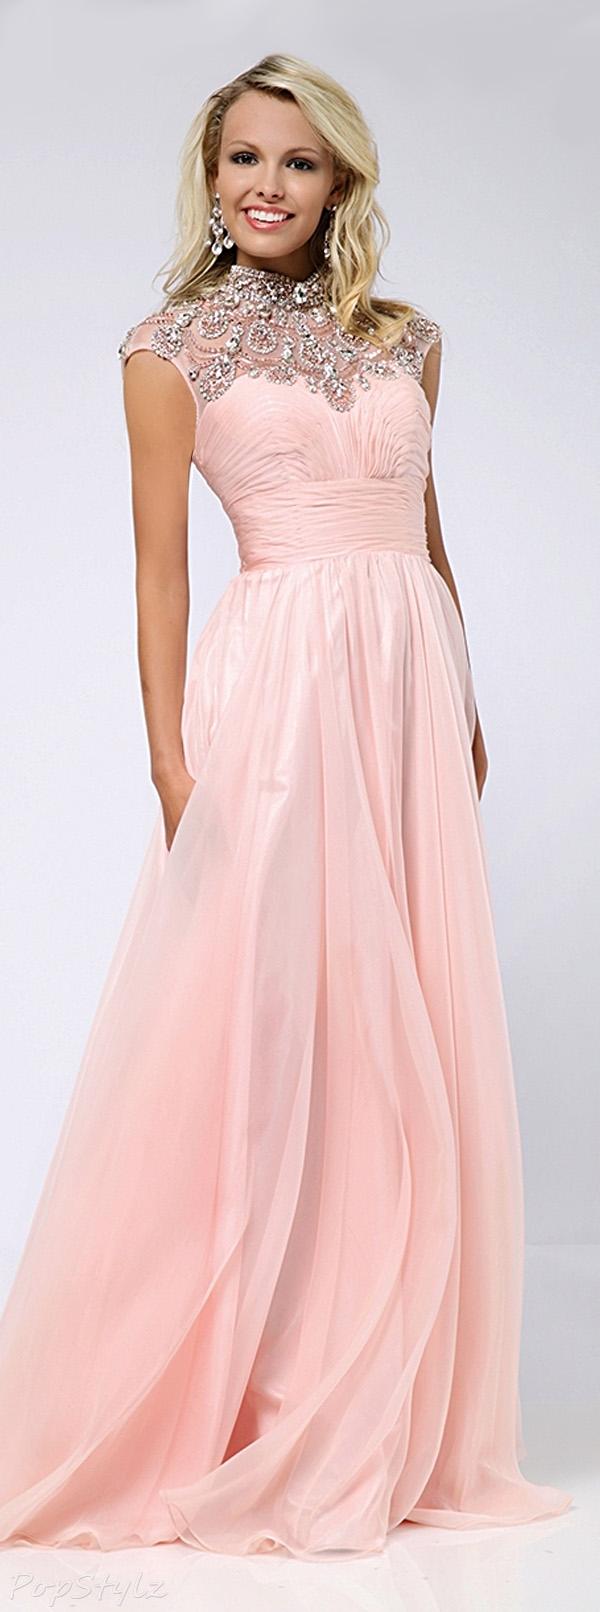 Jovani 20640 Beautiful Long 2015 Evening Gown